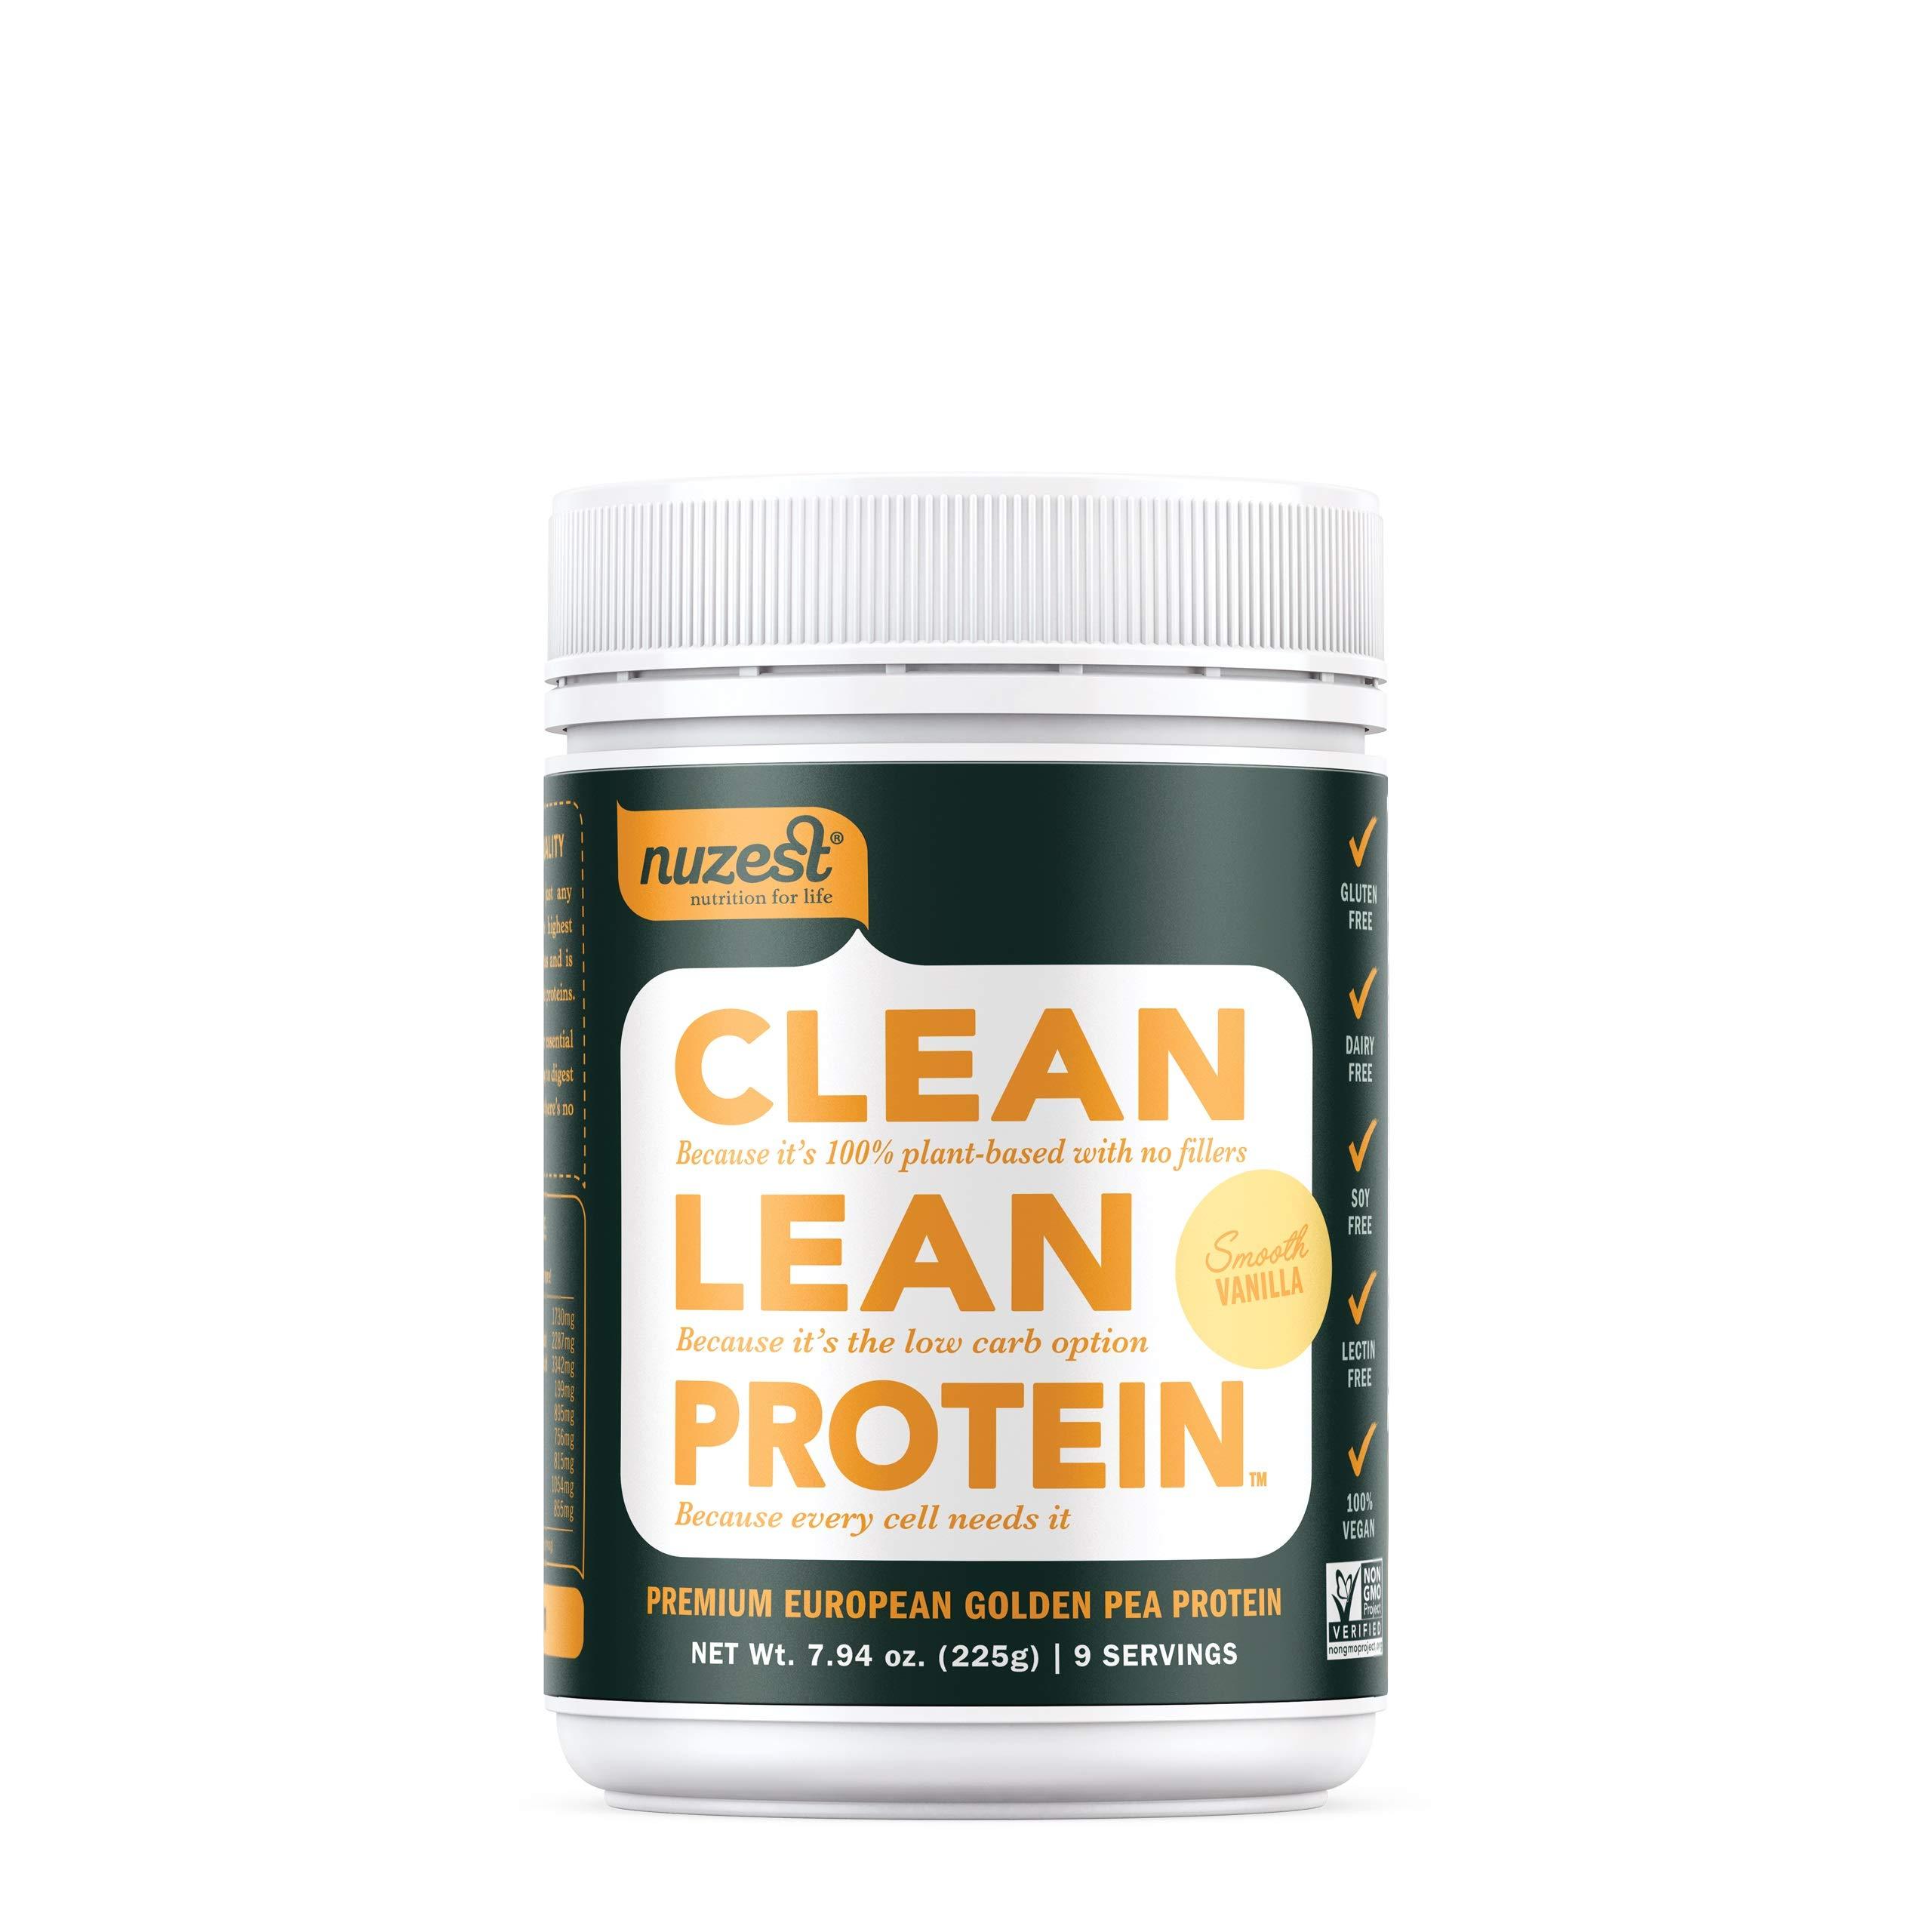 Nuzest Clean Lean Protein - Premium Vegan Protein Powder, Plant Protein Powder, European Golden Pea Protein, Dairy Free, Gluten Free, GMO Free, Naturally Sweetened, Smooth Vanilla, 9 Servings, 7.9 oz